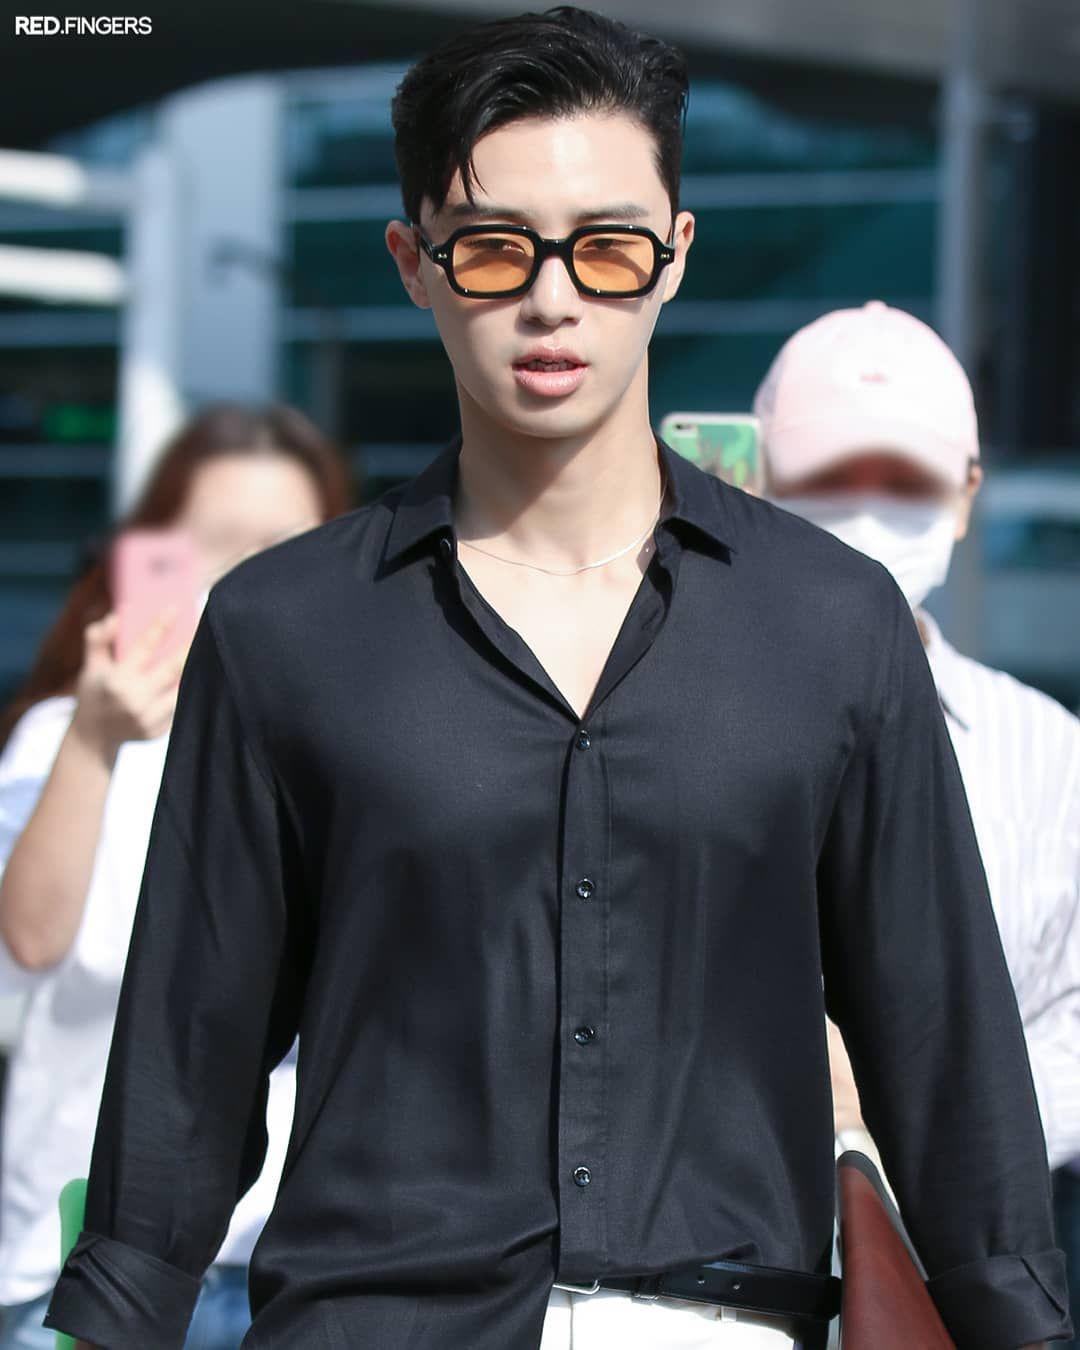 seojoon pics on Twitter